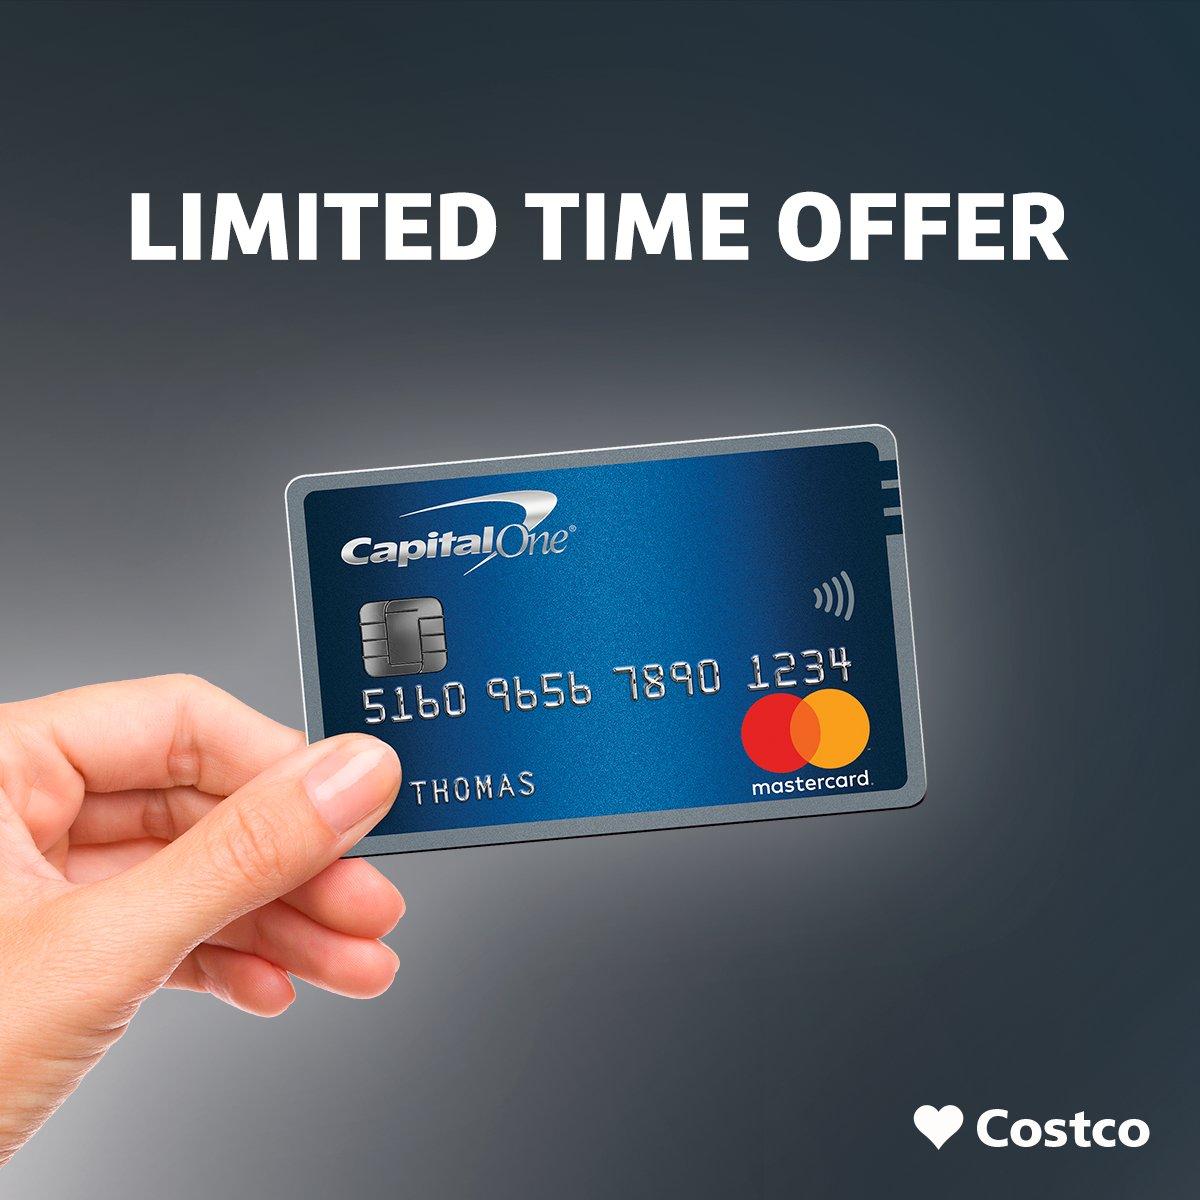 9d2d83bb3d3 Costco Canada Twitter પર